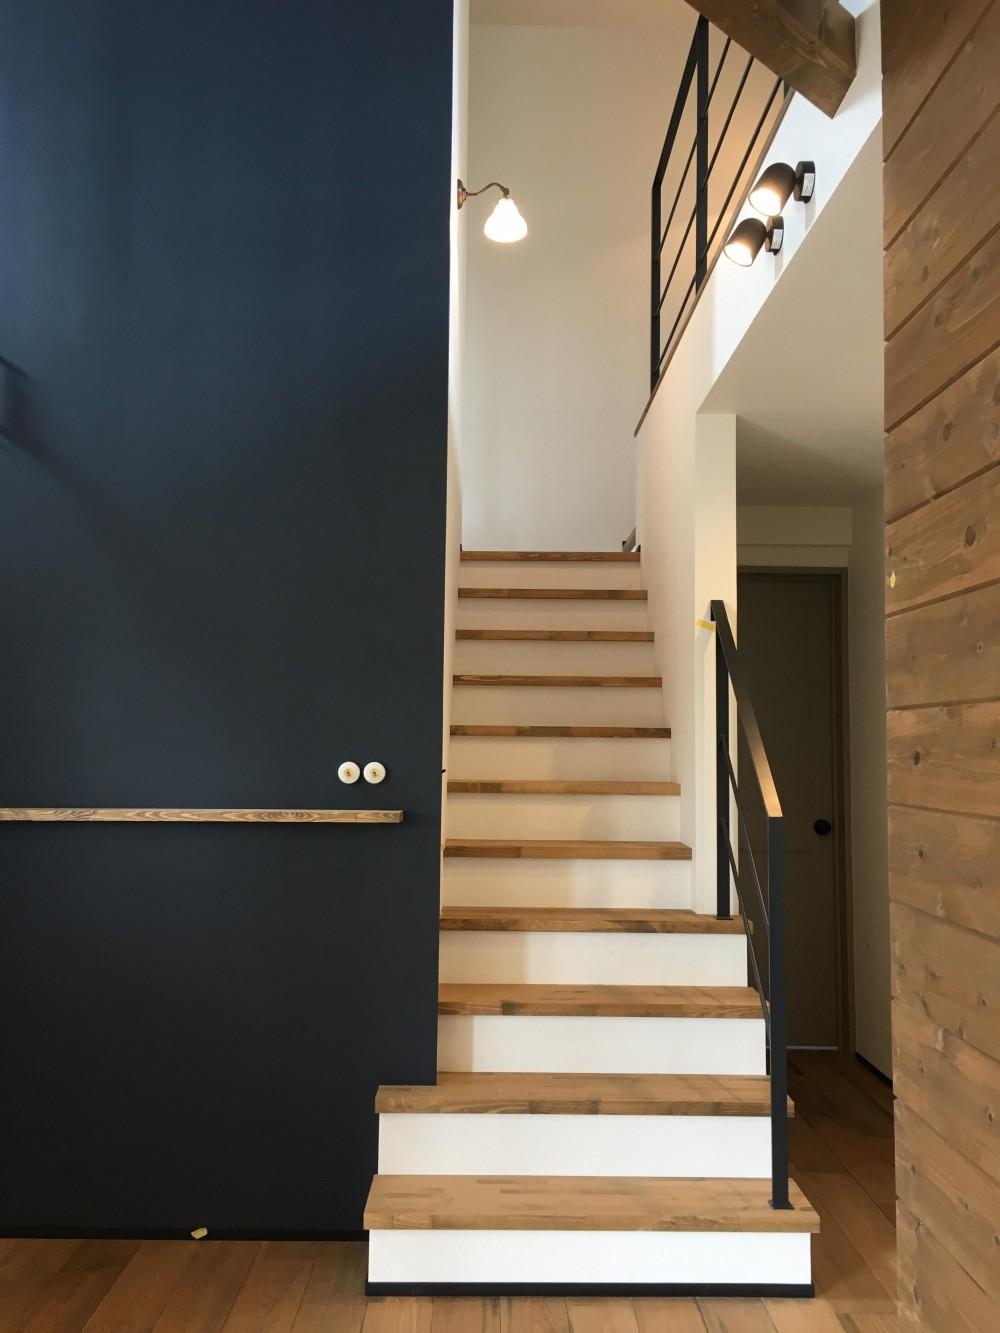 CASAXLABO戸建てリノベーション 札幌市K邸 (階段)